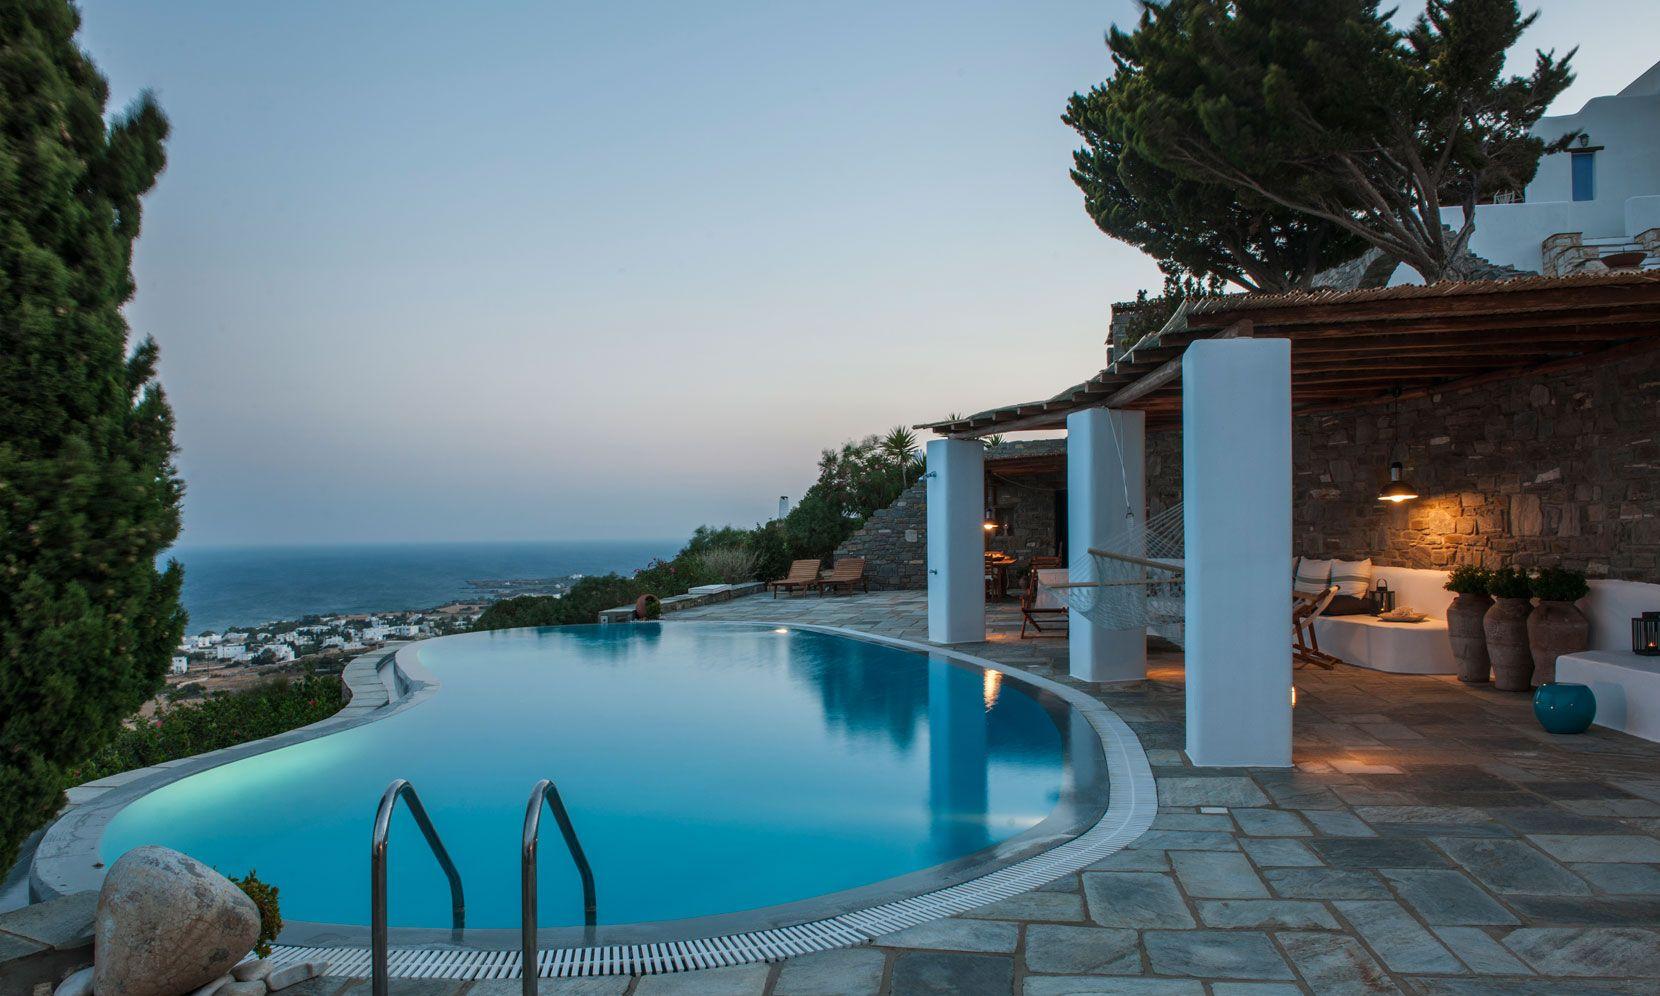 Paros Villa Hesperus jumbotron image